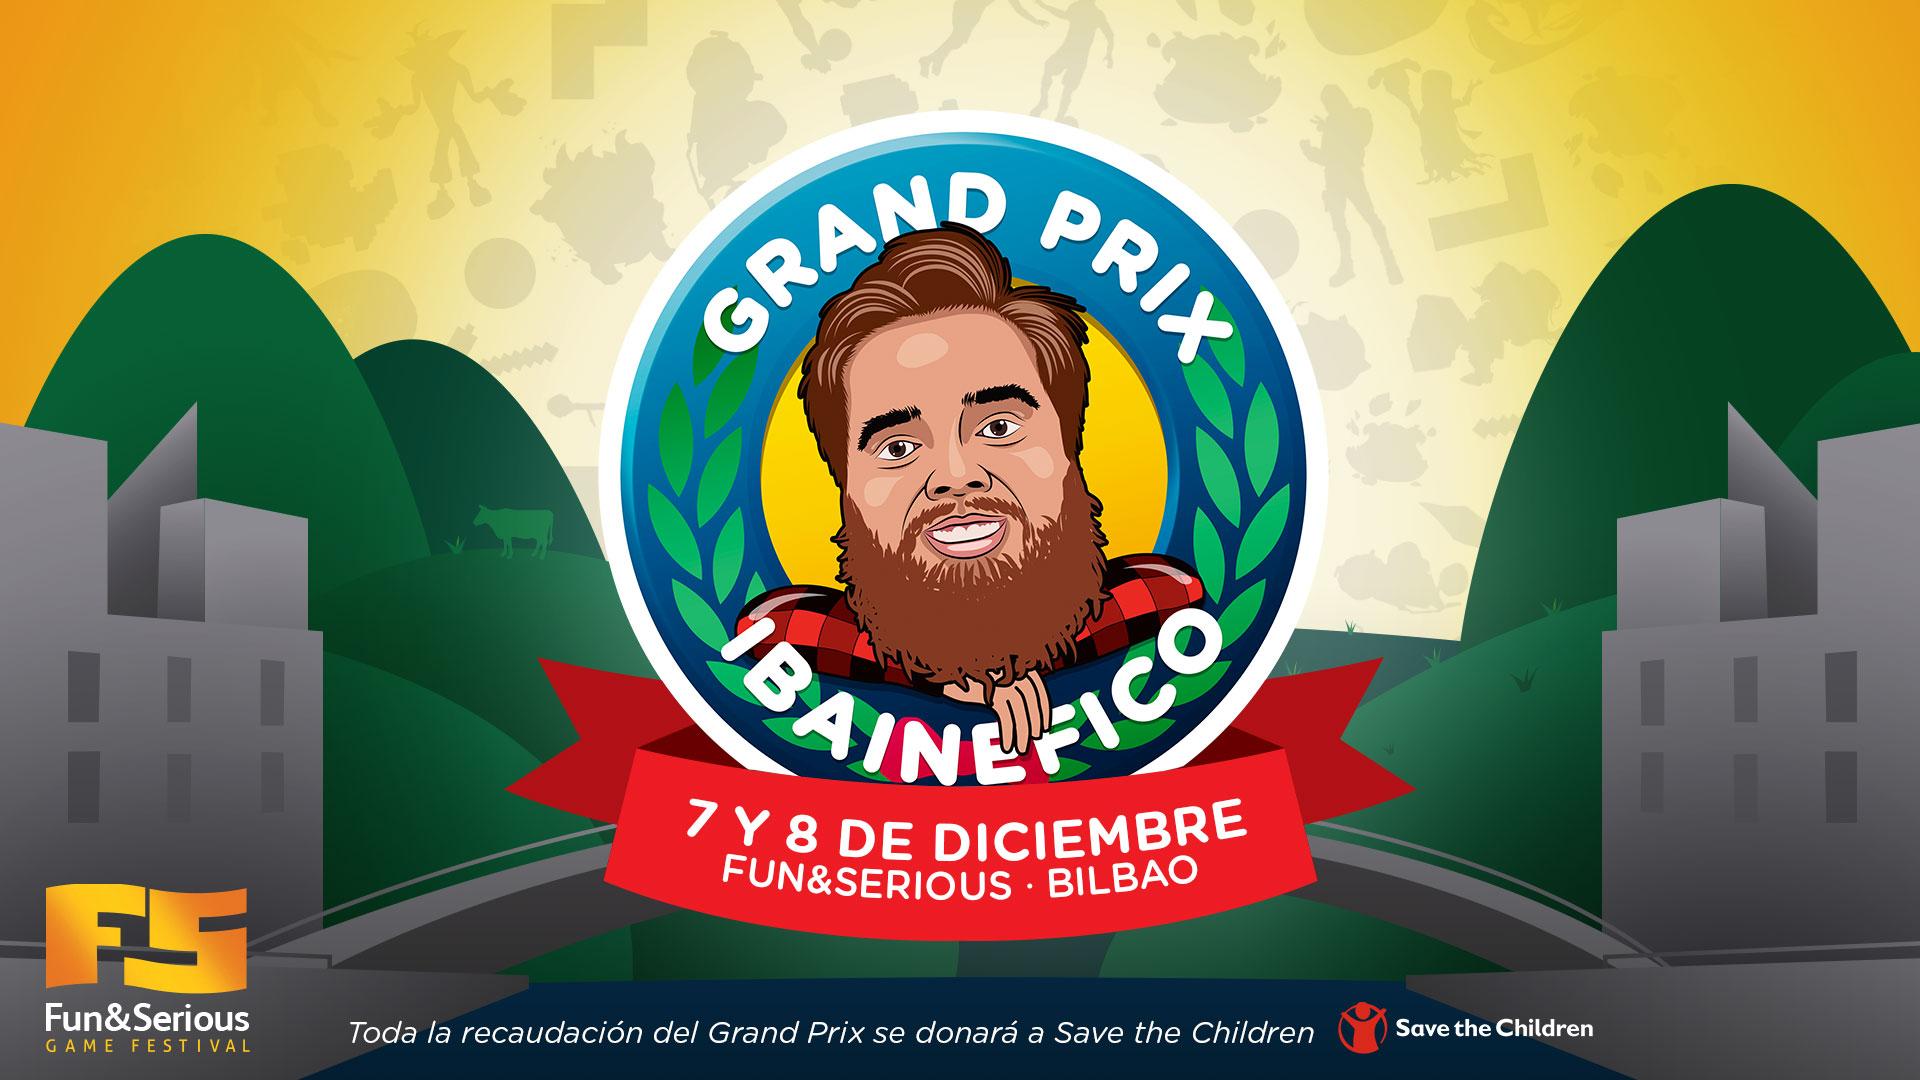 torneo-ibai-benefico-bilbao-2019